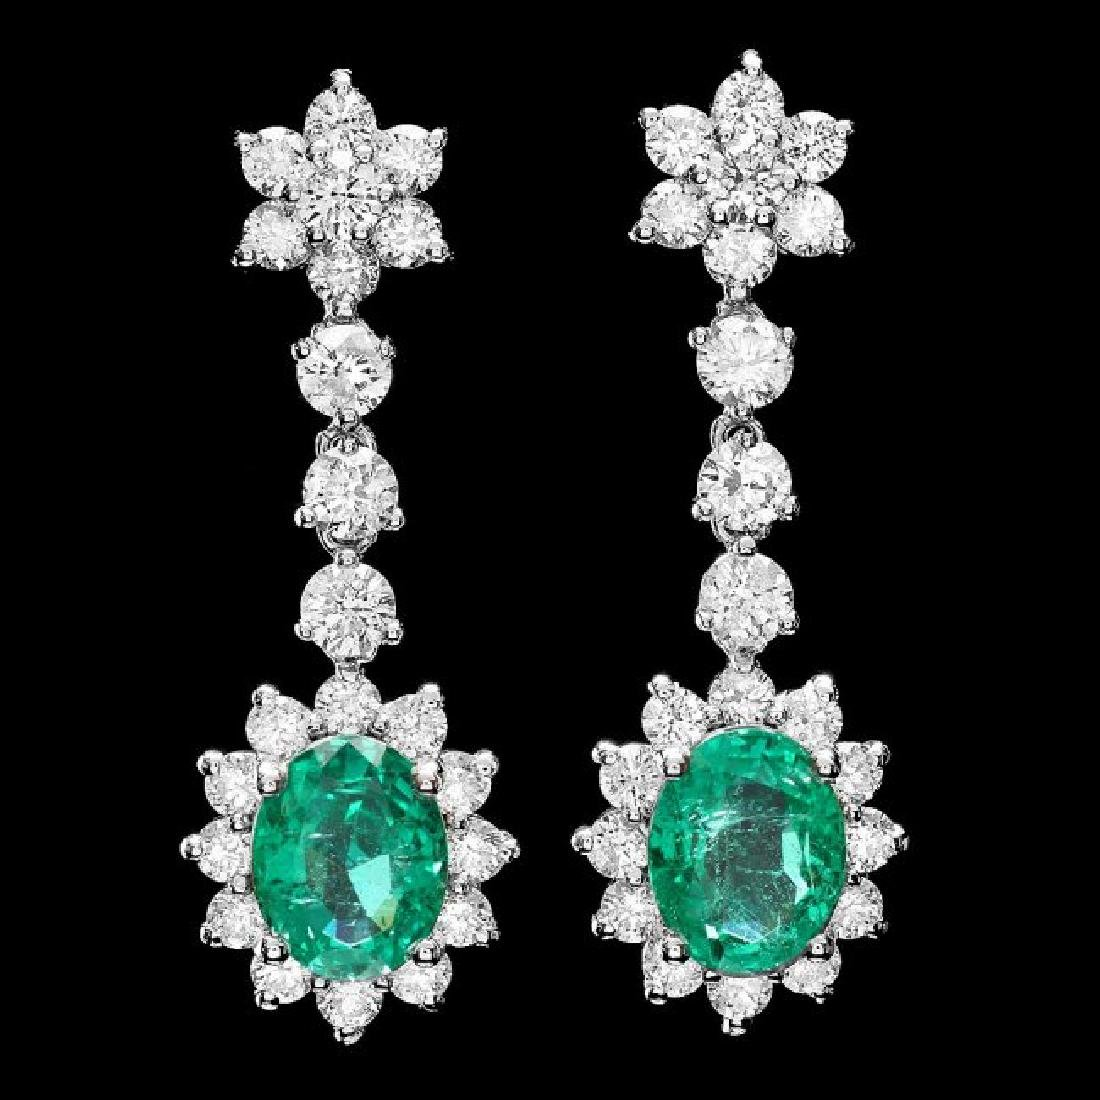 14k Gold 4ct Emerald 3.20ct Diamond Earrings - 3